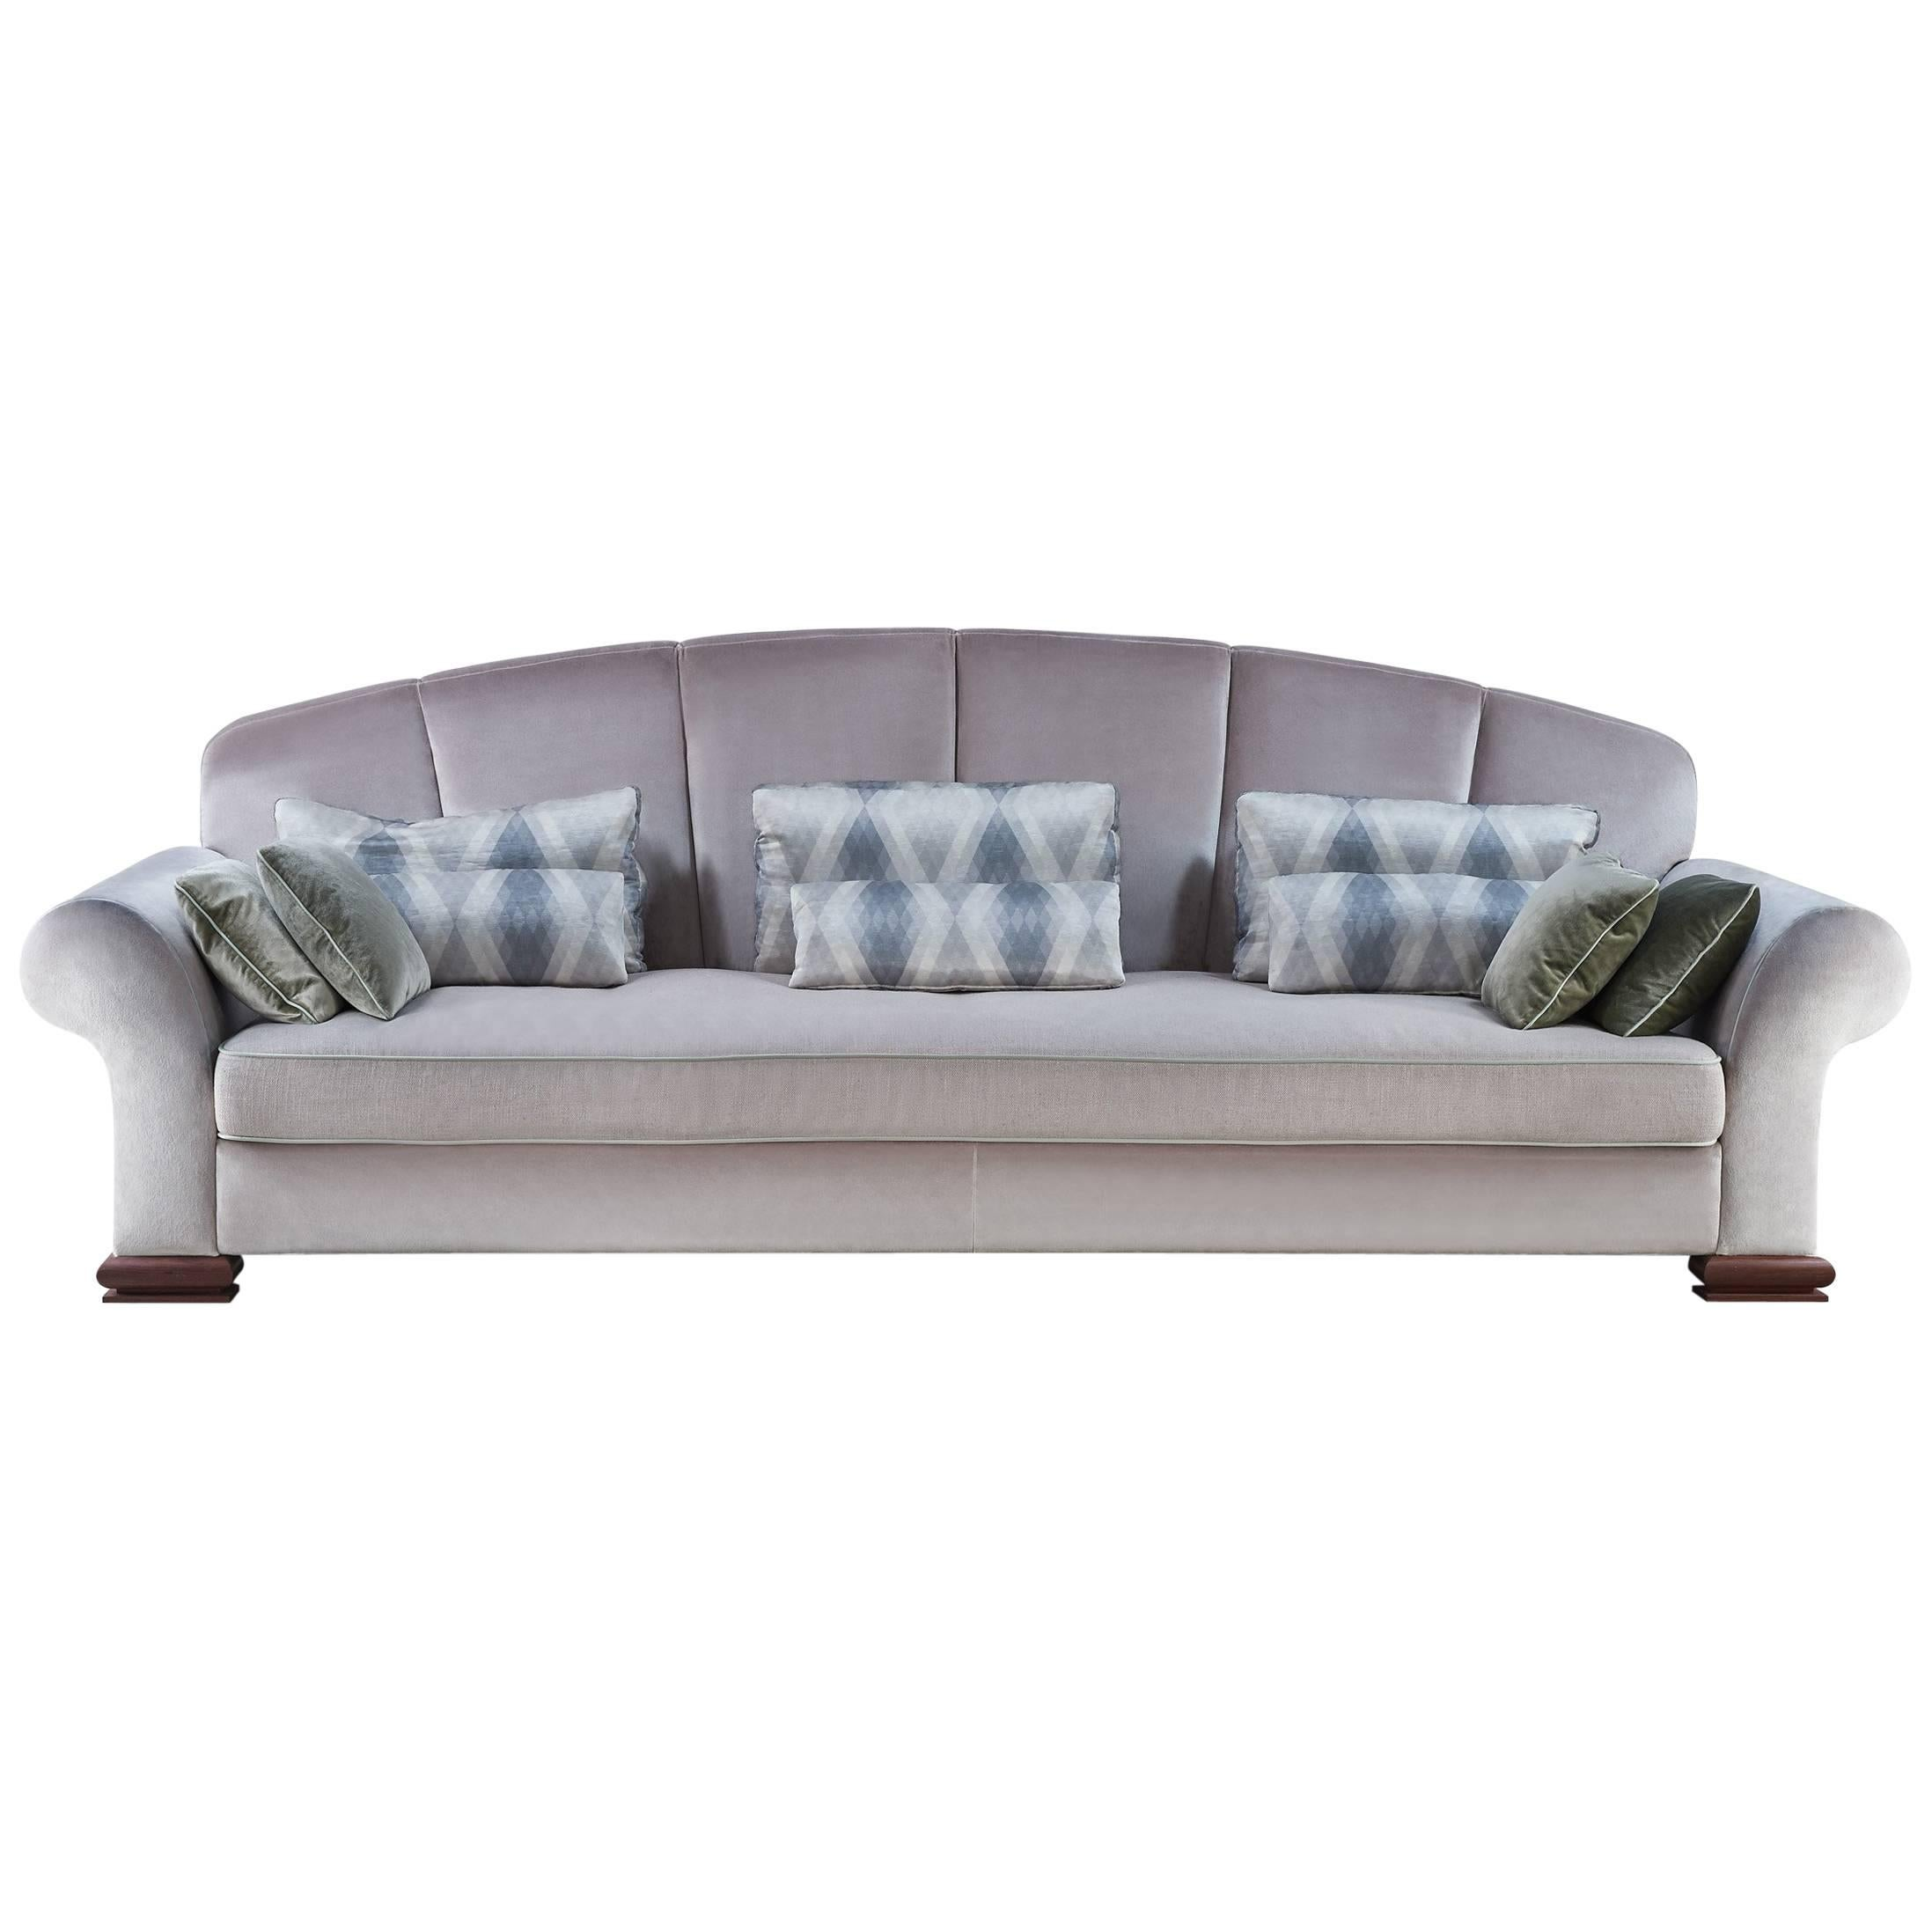 Large Art Deco Sofa By Rinck